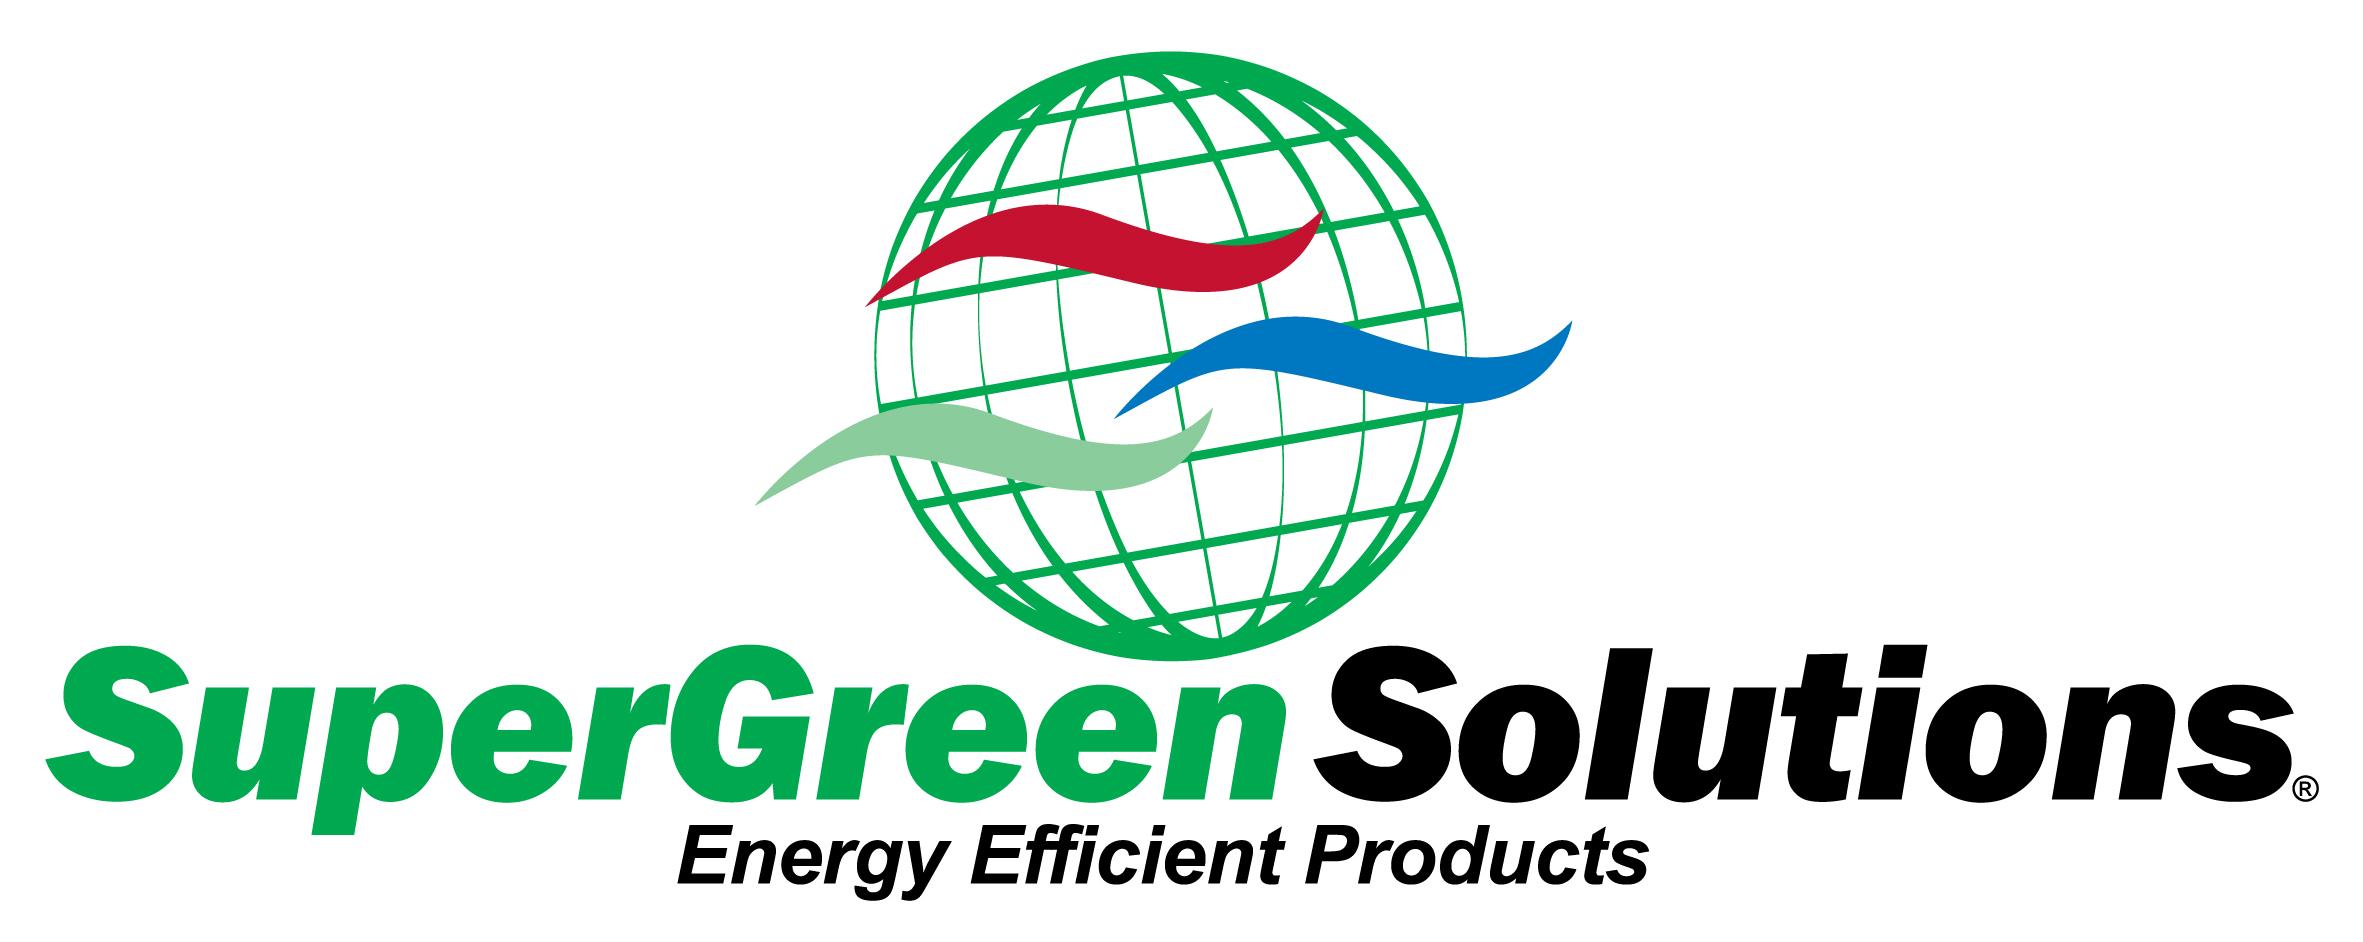 SuperGreen Solutions Oceanside image 1